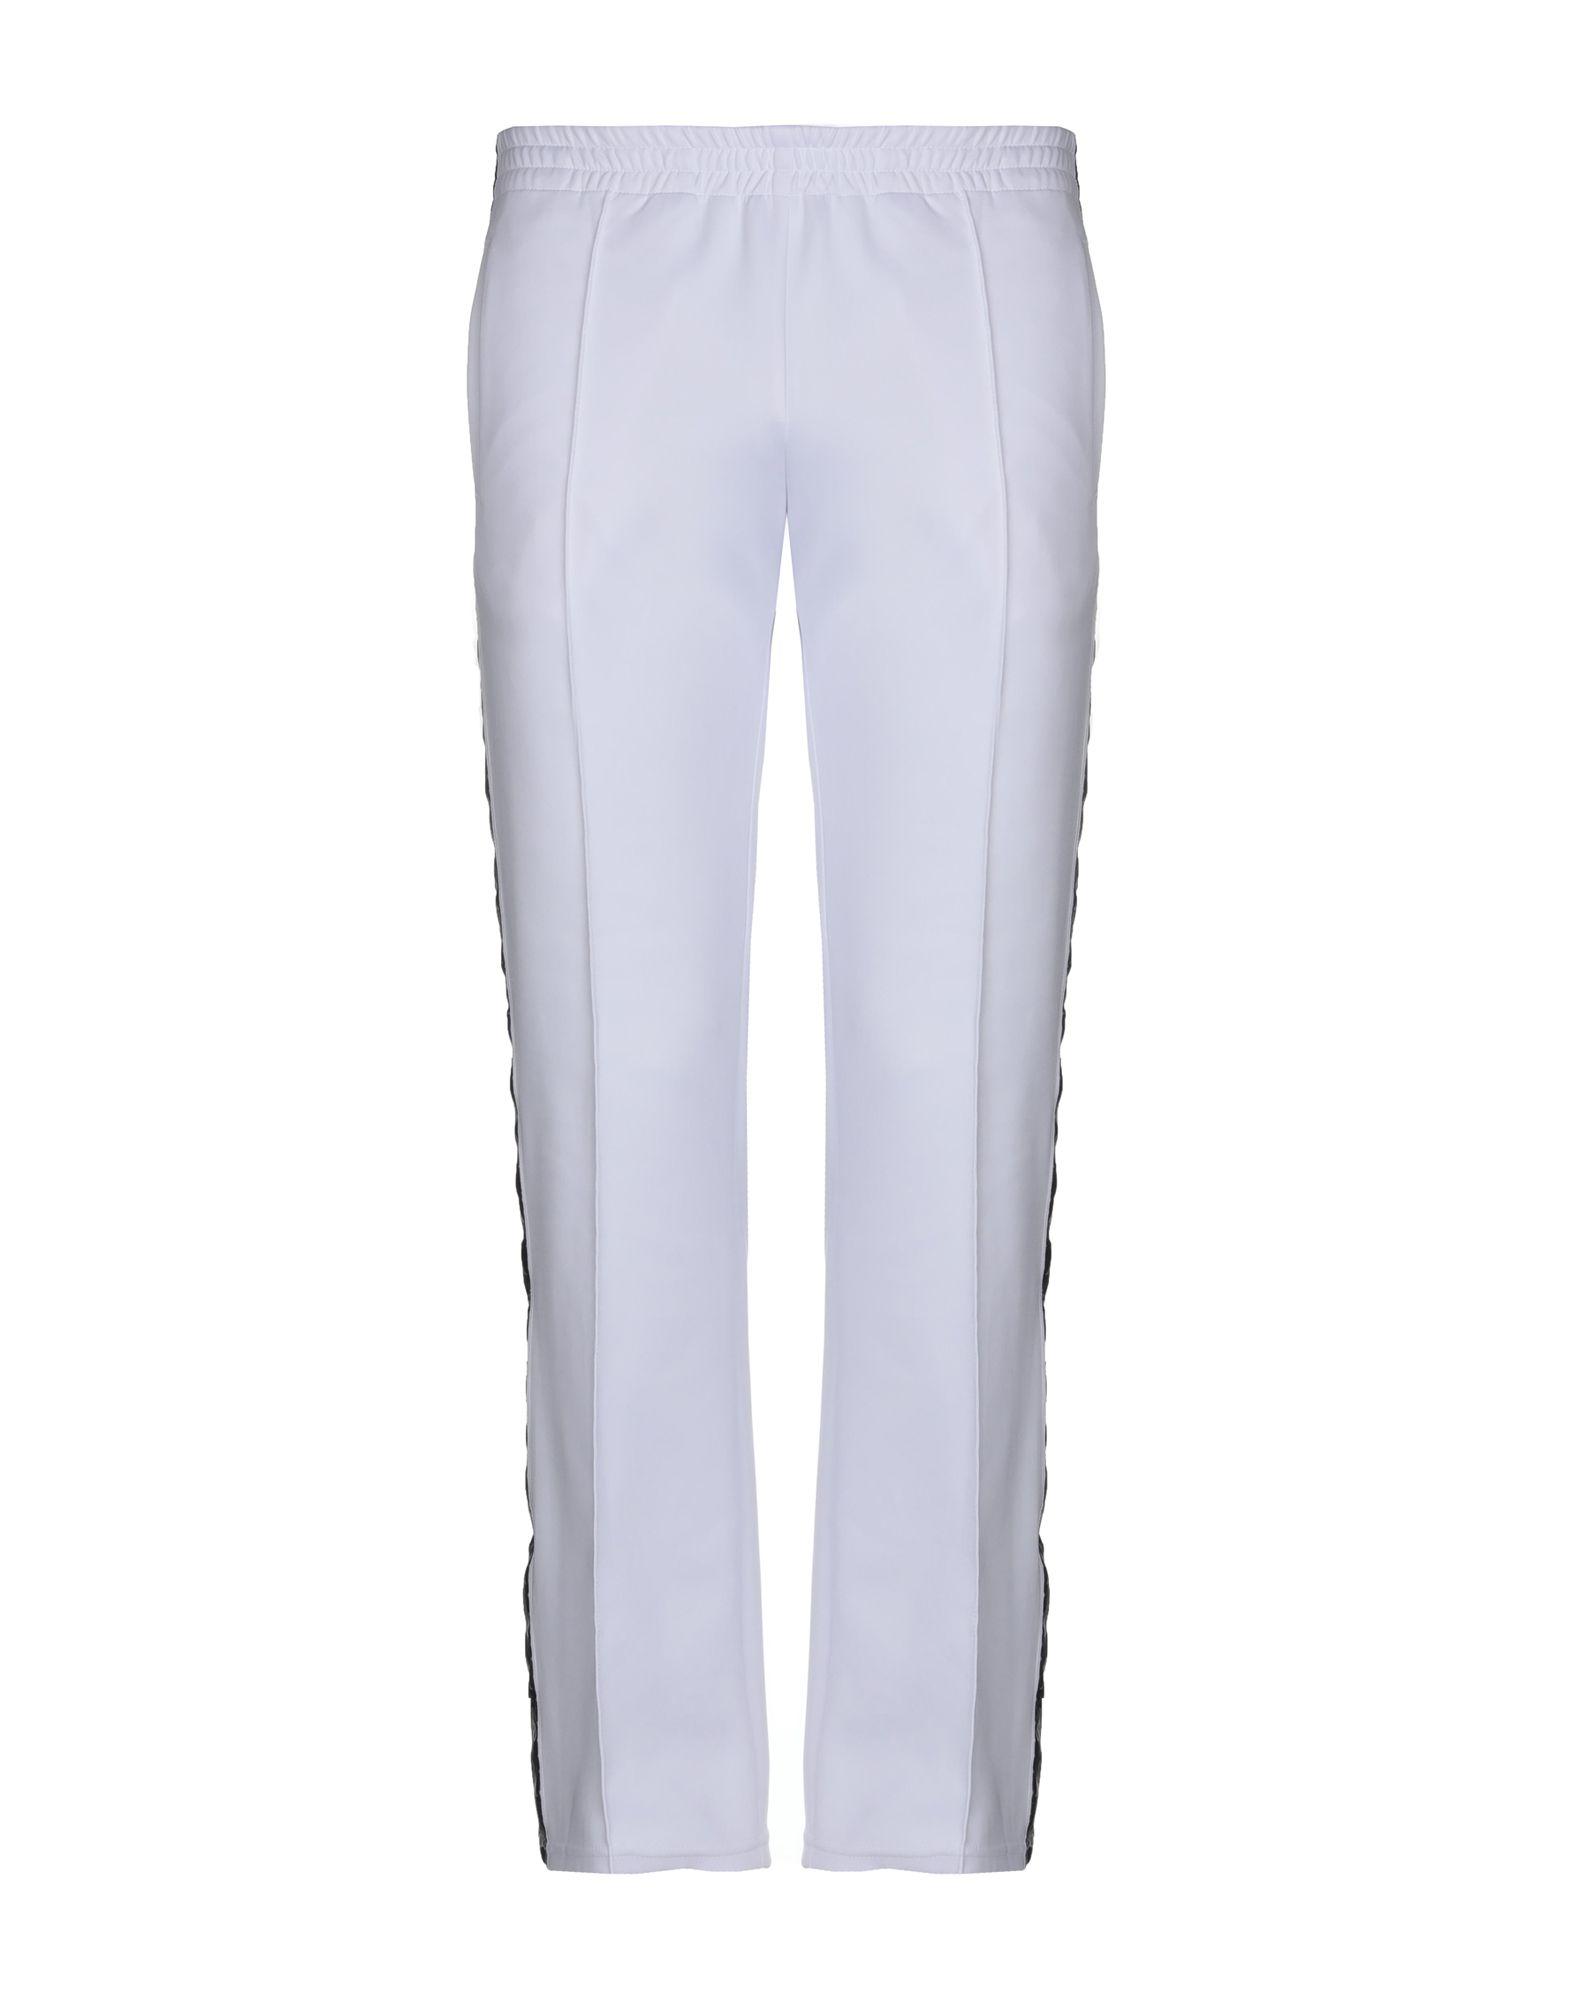 KAPPA x FAITH CONNEXION Повседневные брюки